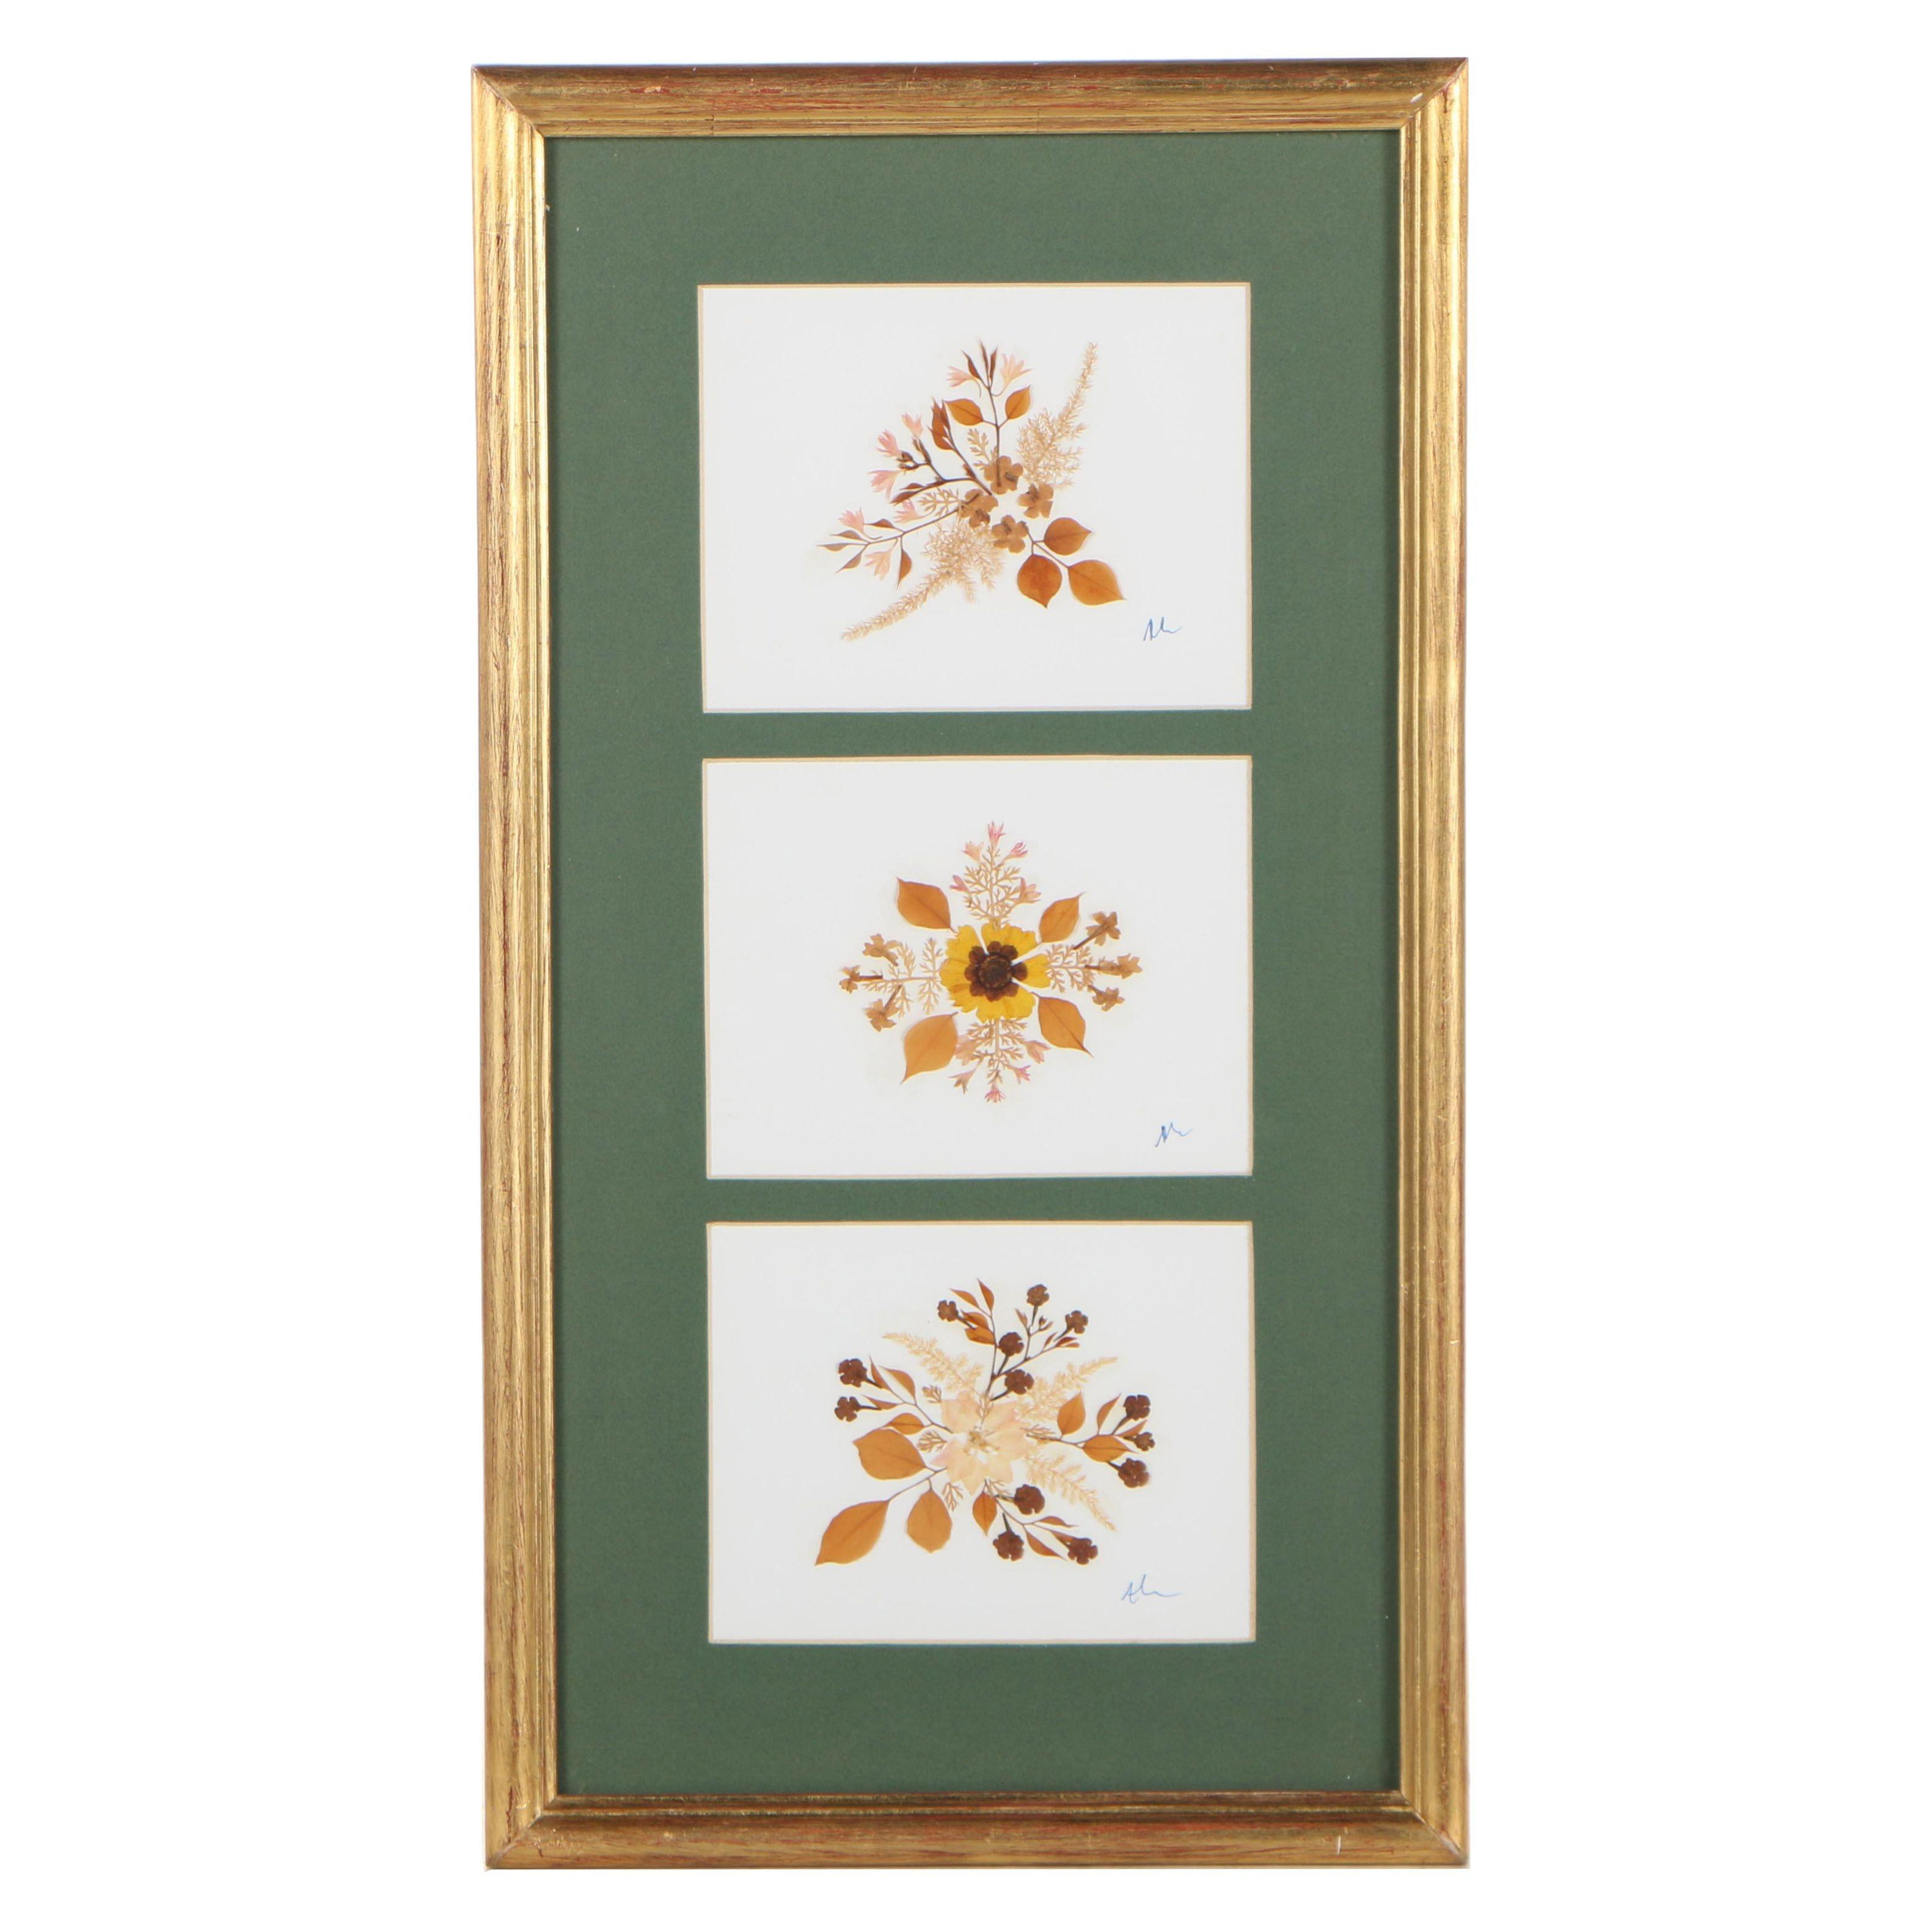 Pressed Flower Artwork